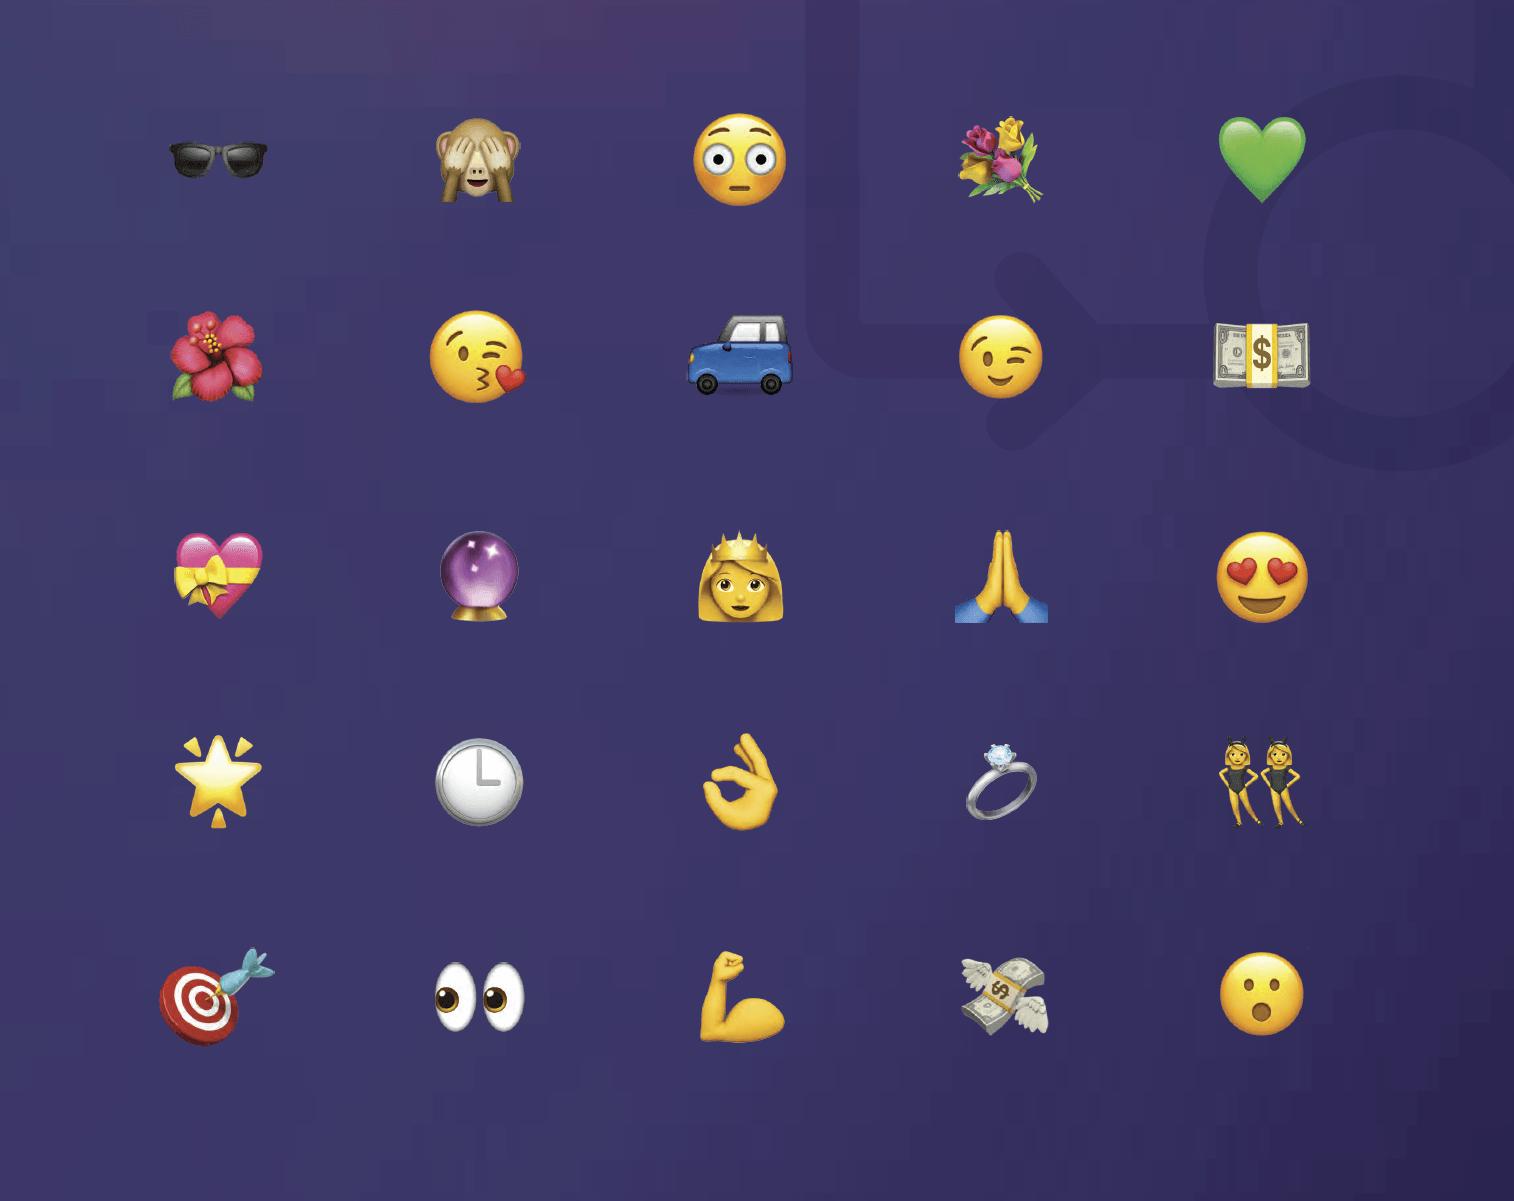 mobile marketing emoji